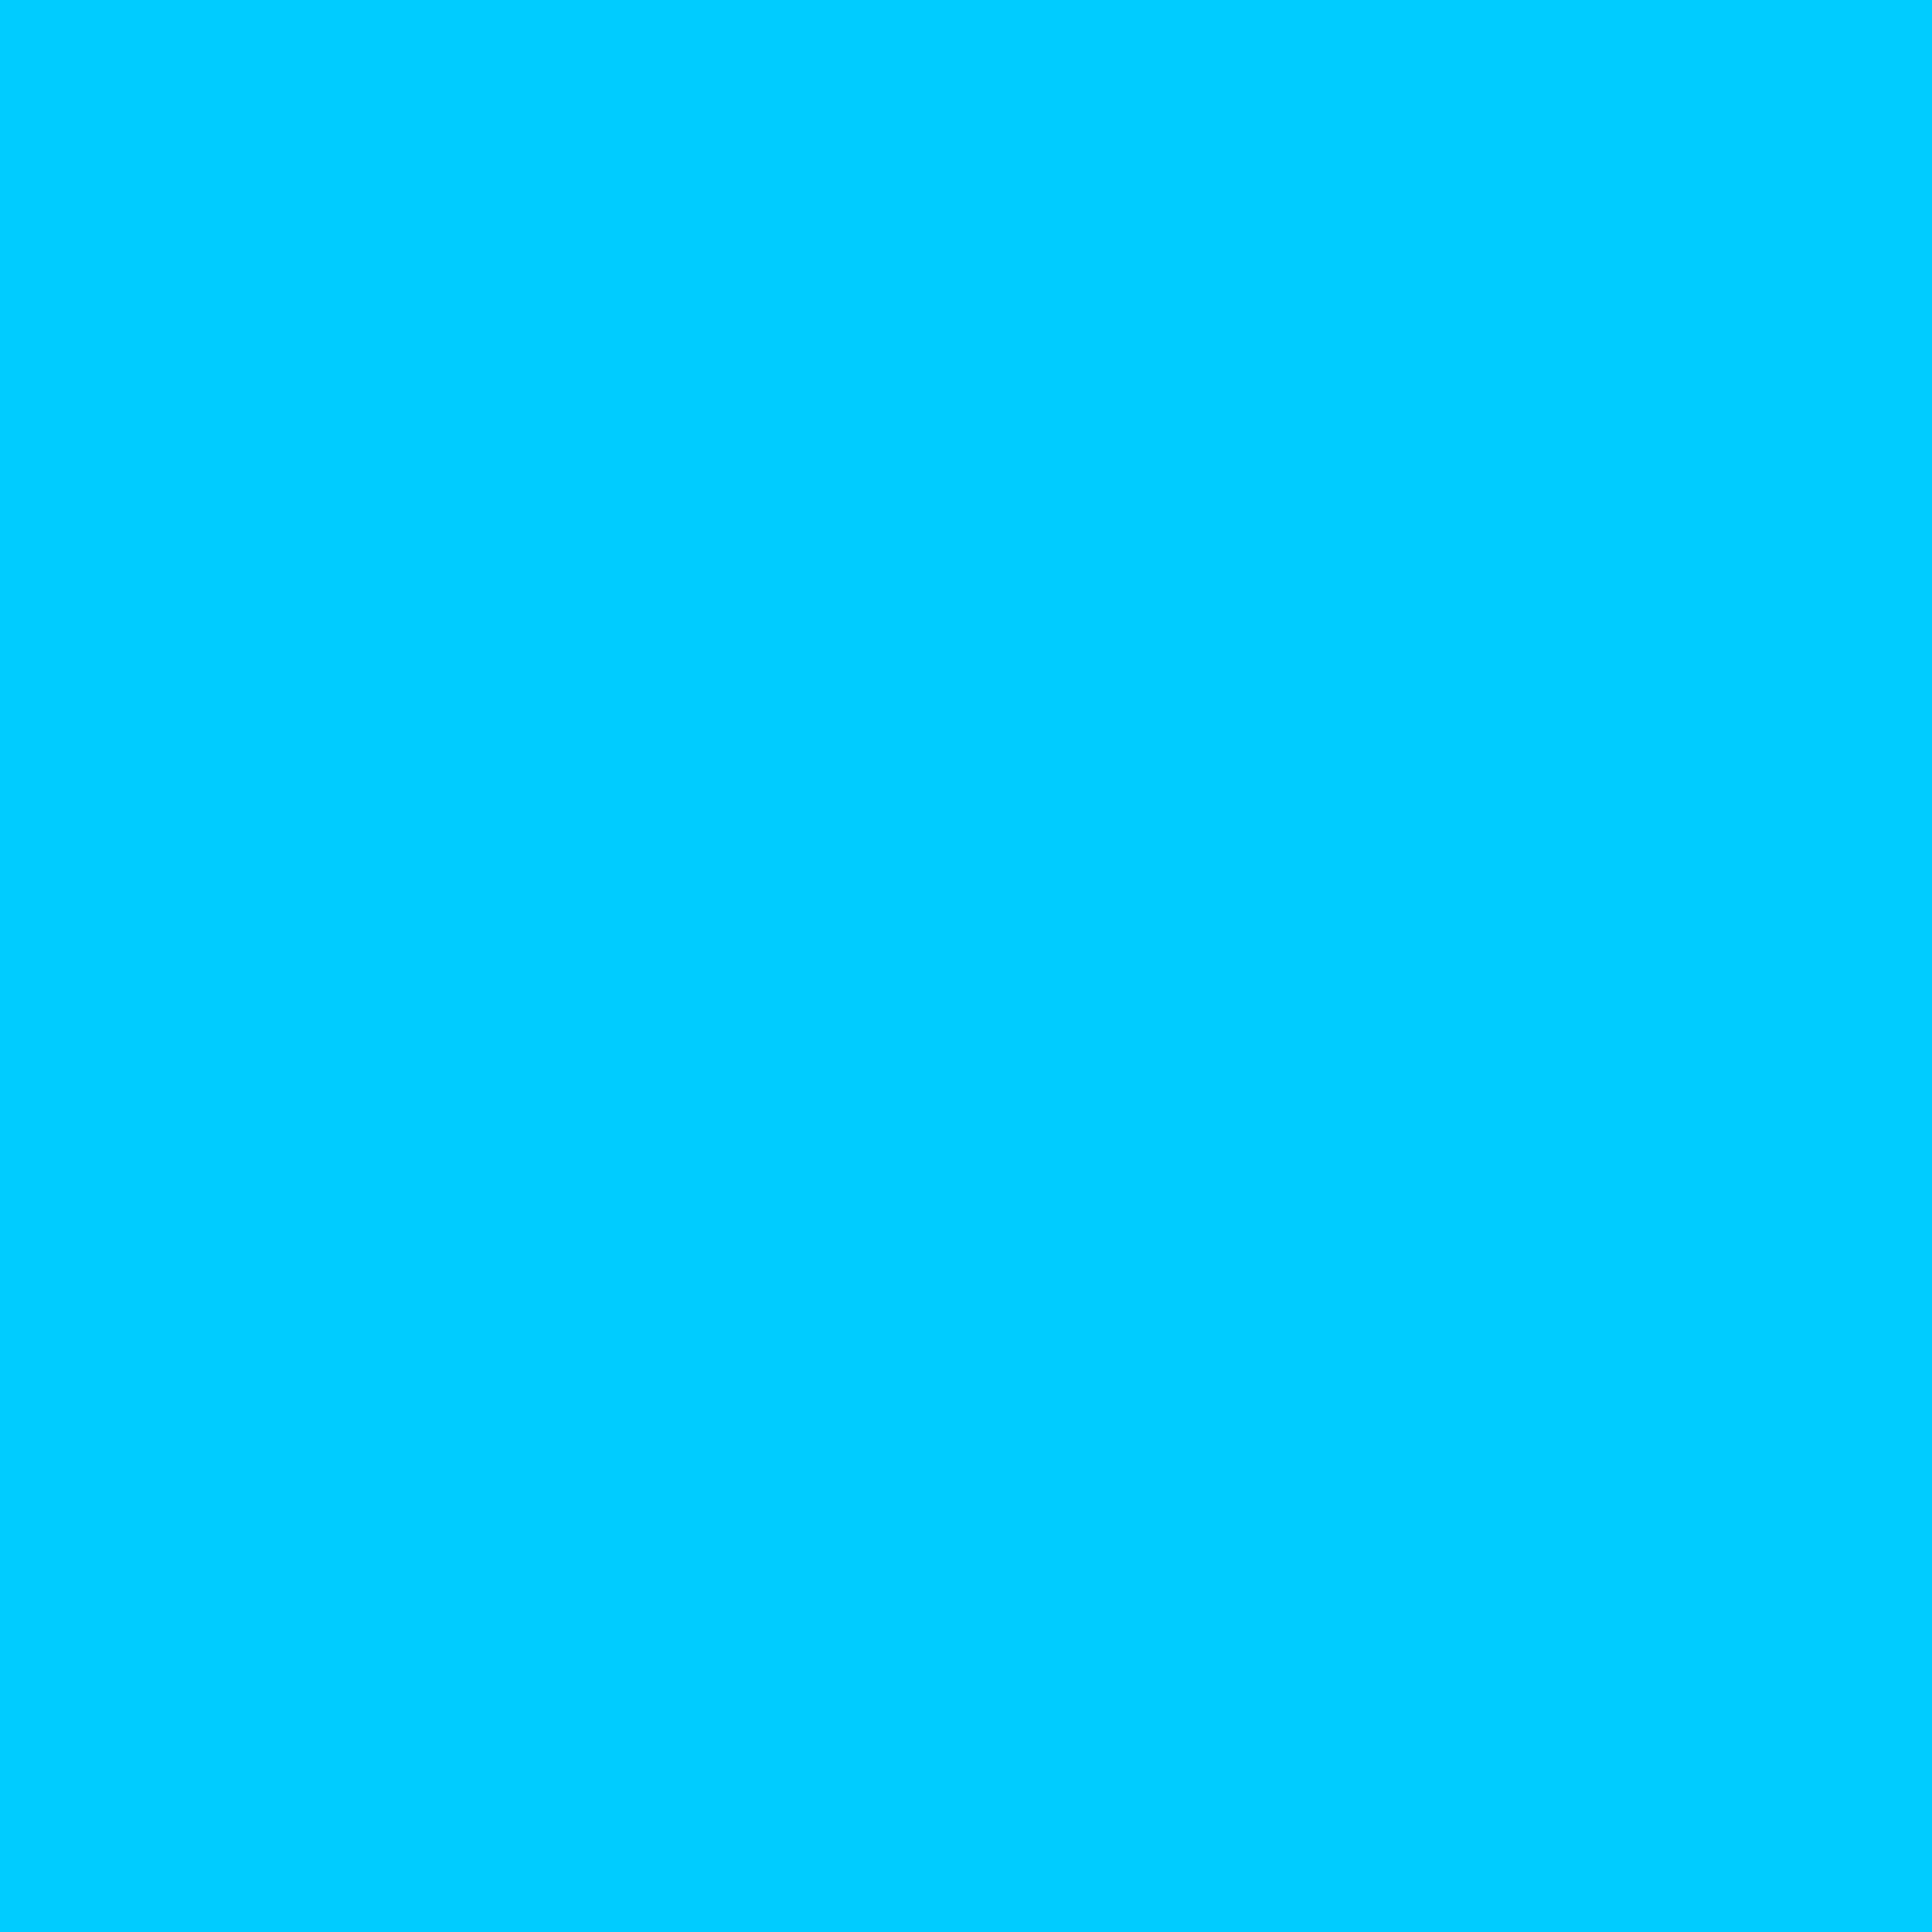 3600x3600 Vivid Sky Blue Solid Color Background